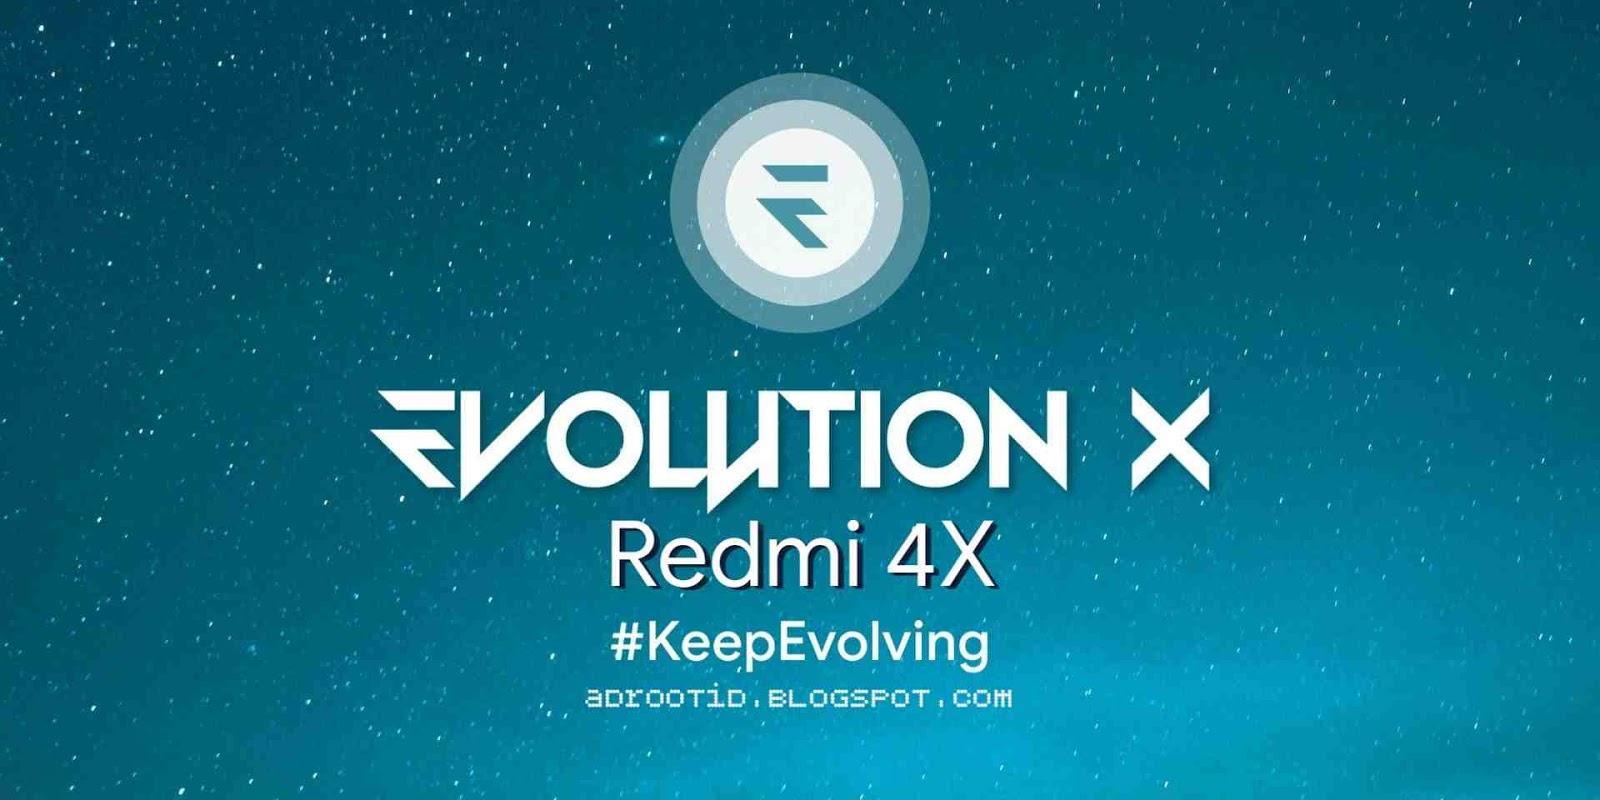 Evolution X Rom Redmi 4X